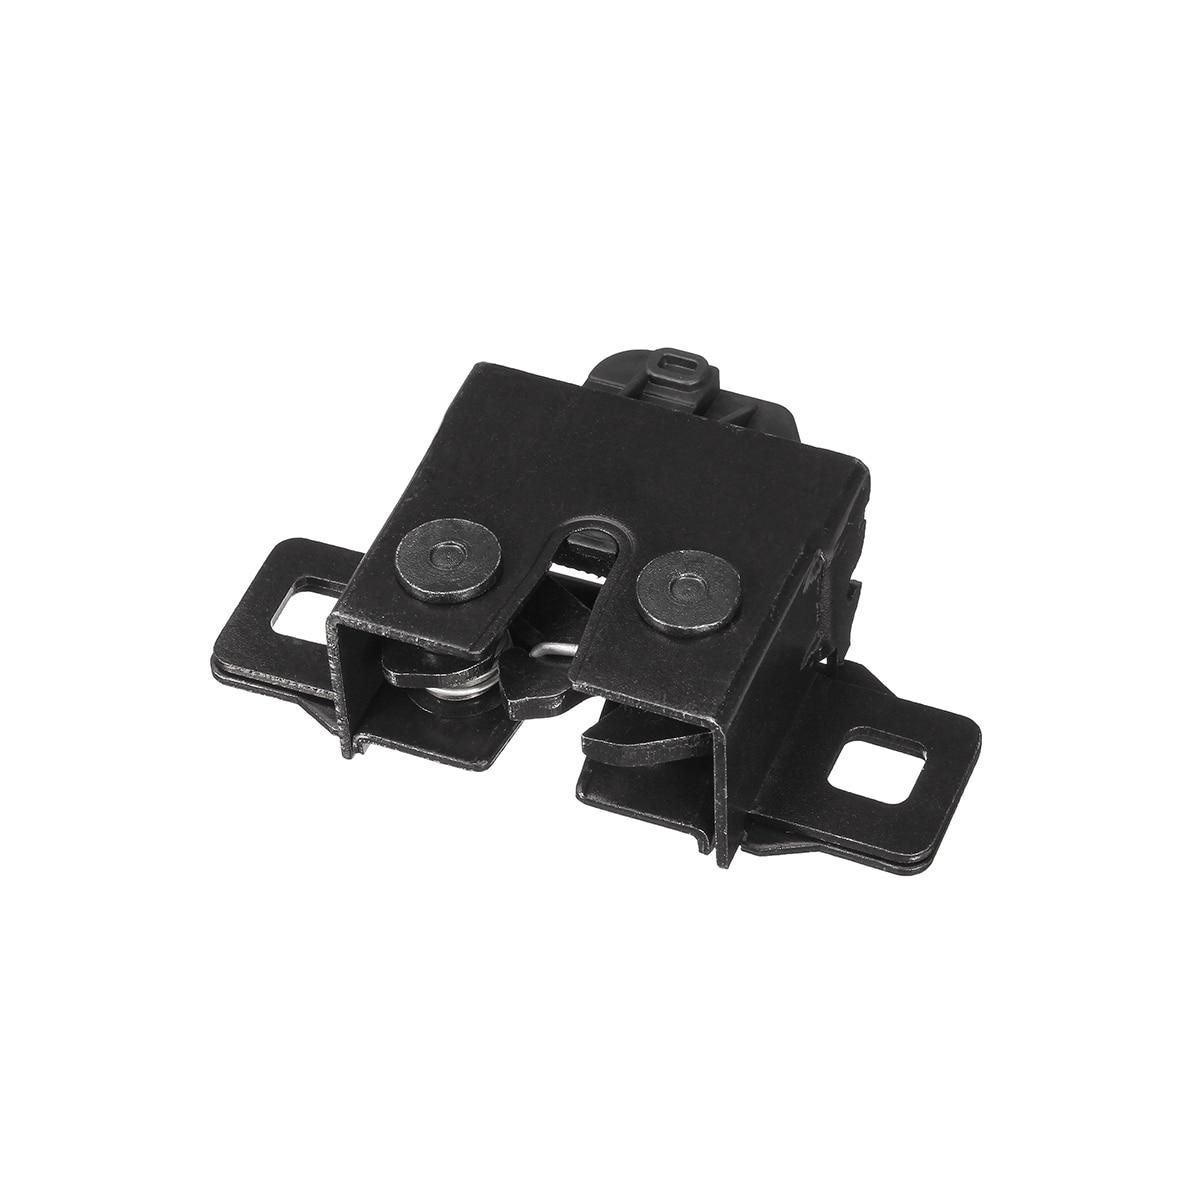 LR065340 LR041431 Hood Alarm Anti Theft Switch Latch Sensor For Land Rover Sport LR3 Discovery